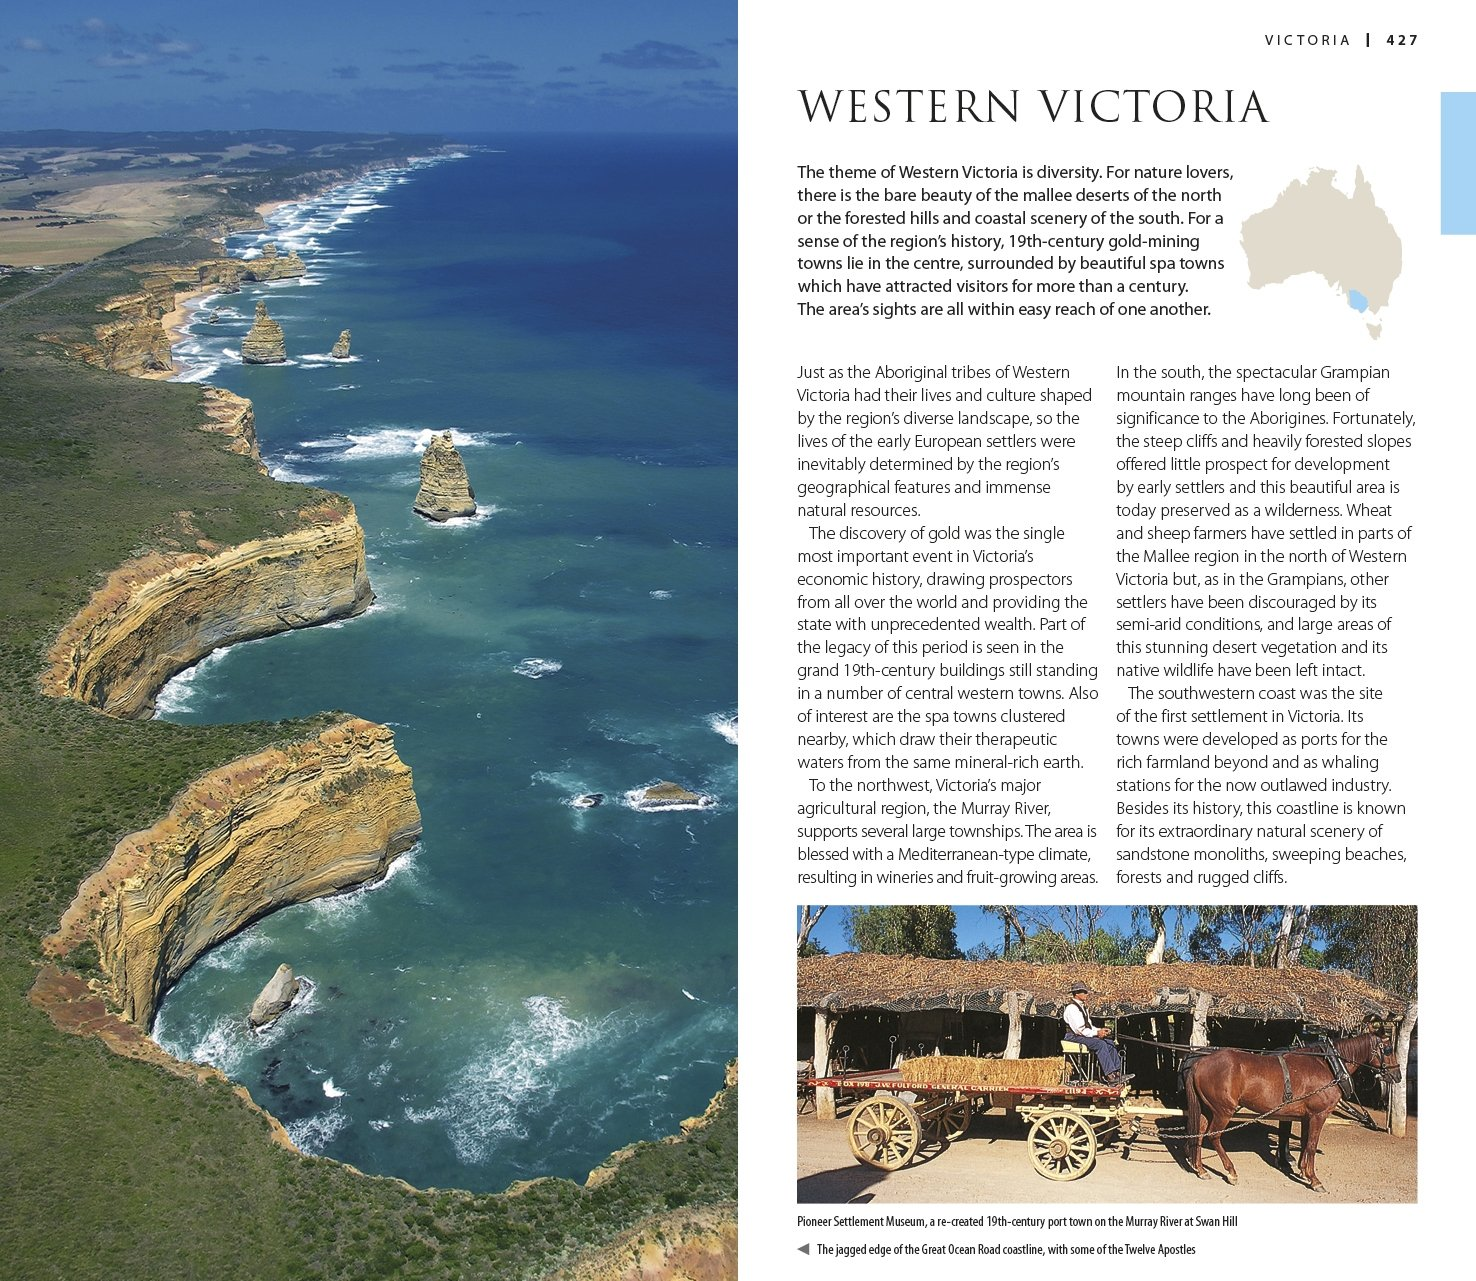 DK Eyewitness Travel Guide Australia - 81uuhVfig6L - Getting Down Under